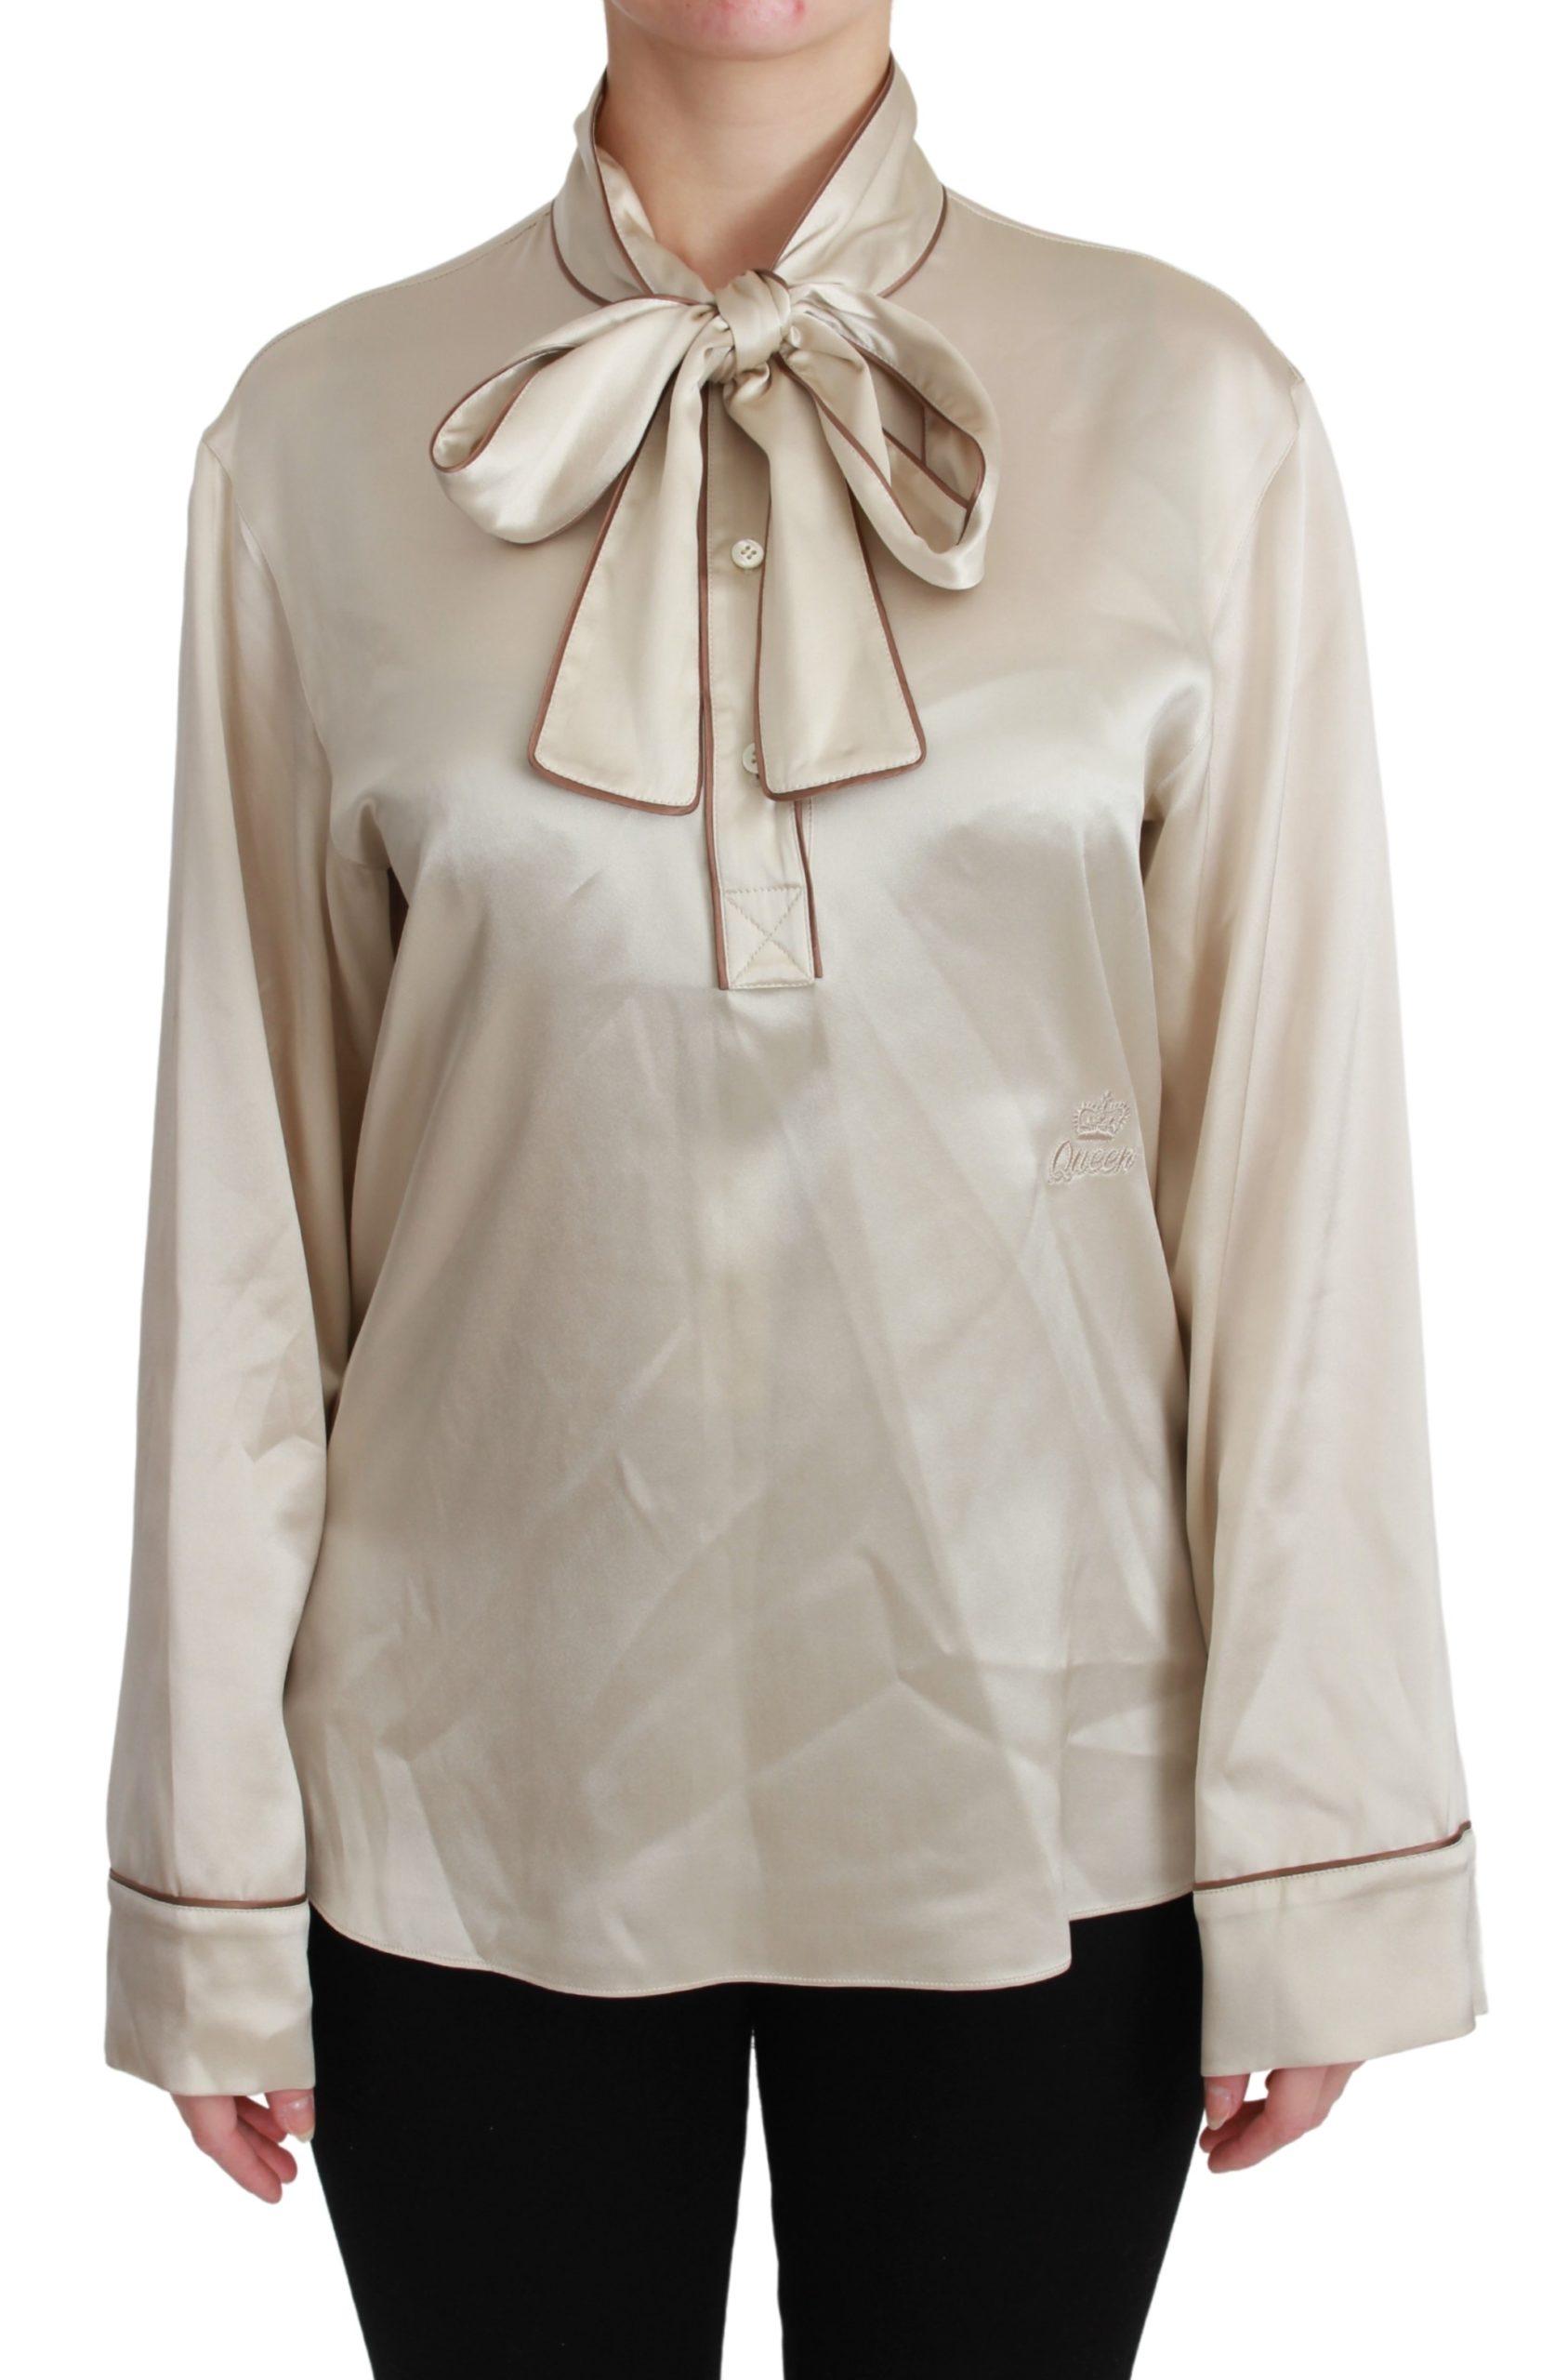 Dolce & Gabbana Women's Sleeve Queen Silk Satin Top Beige TSH4657 - IT40|S